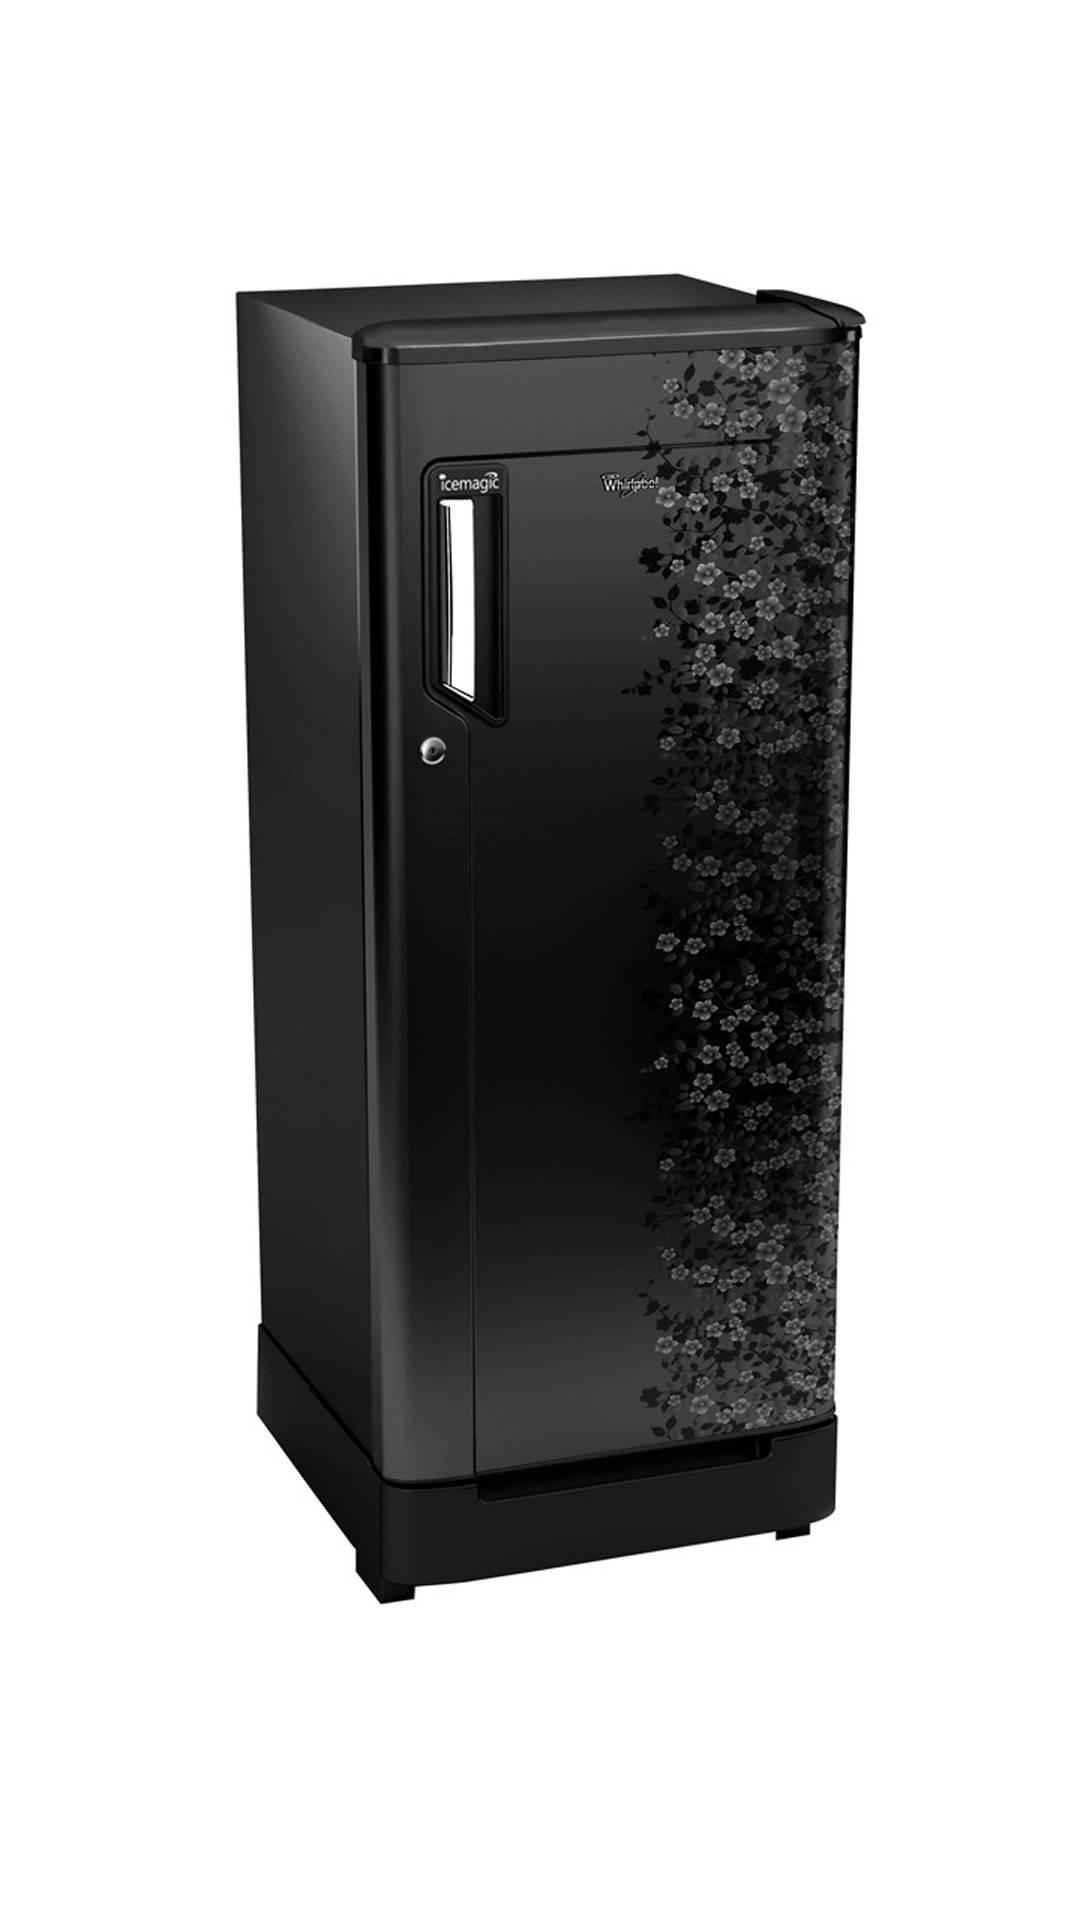 Whirlpool 205 IM Powercool PRM 5S 190 Litres Single Door Refrigerator (Midnight Bloom)